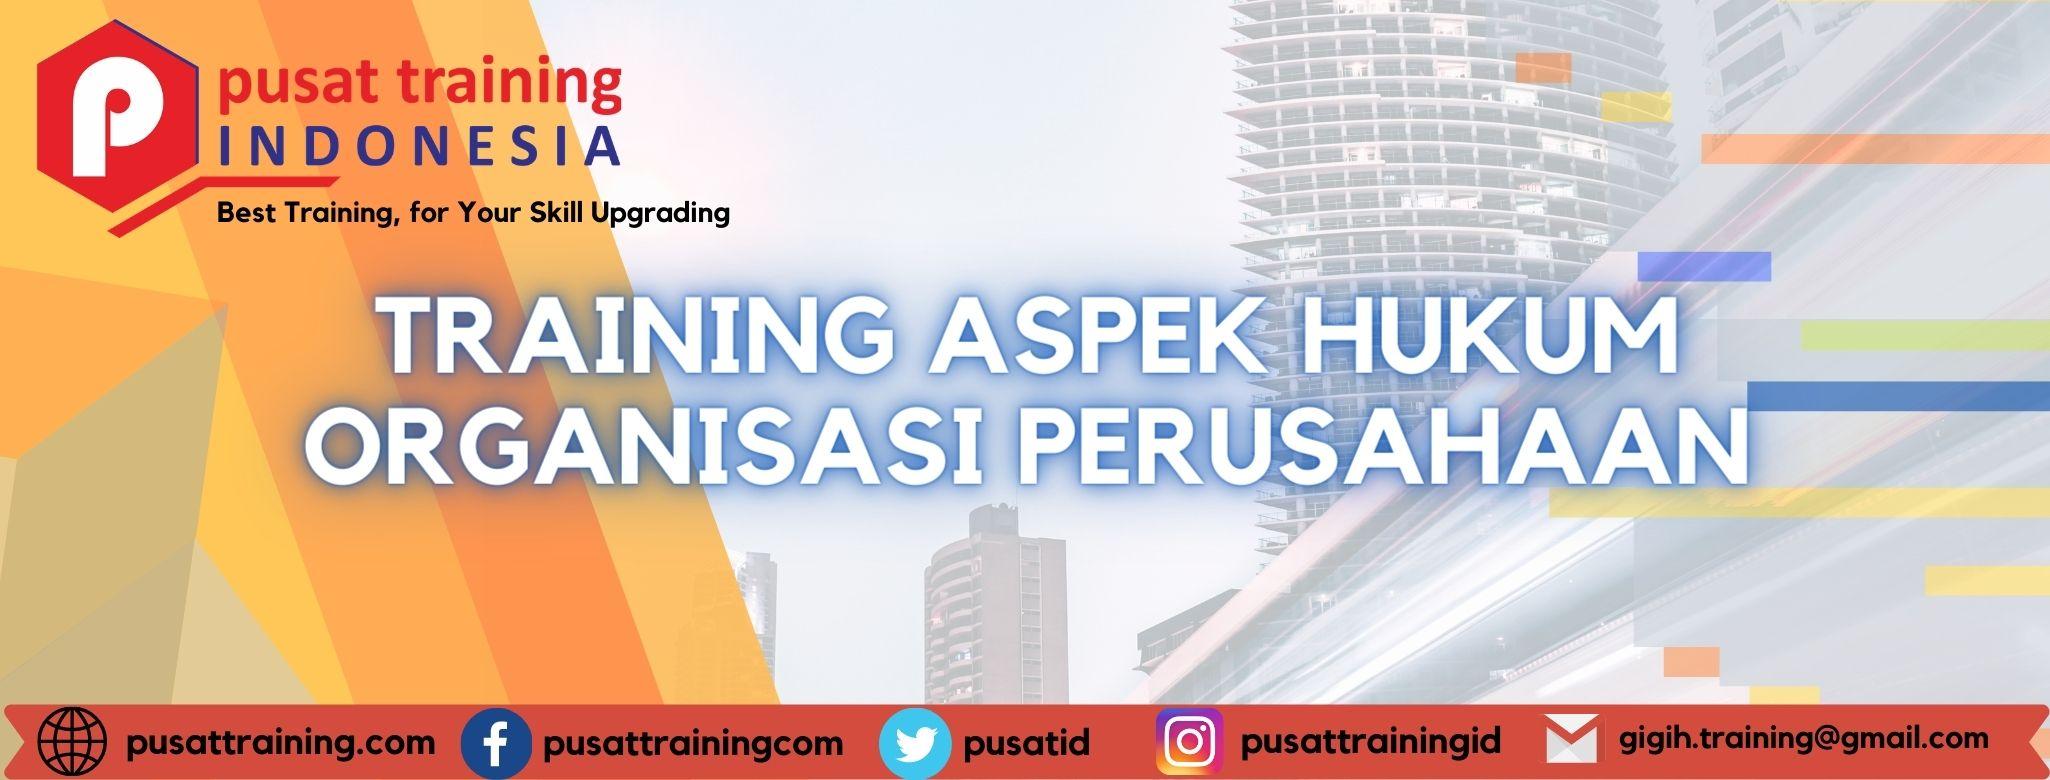 training-aspek-hukum-organisasi-perusahaan